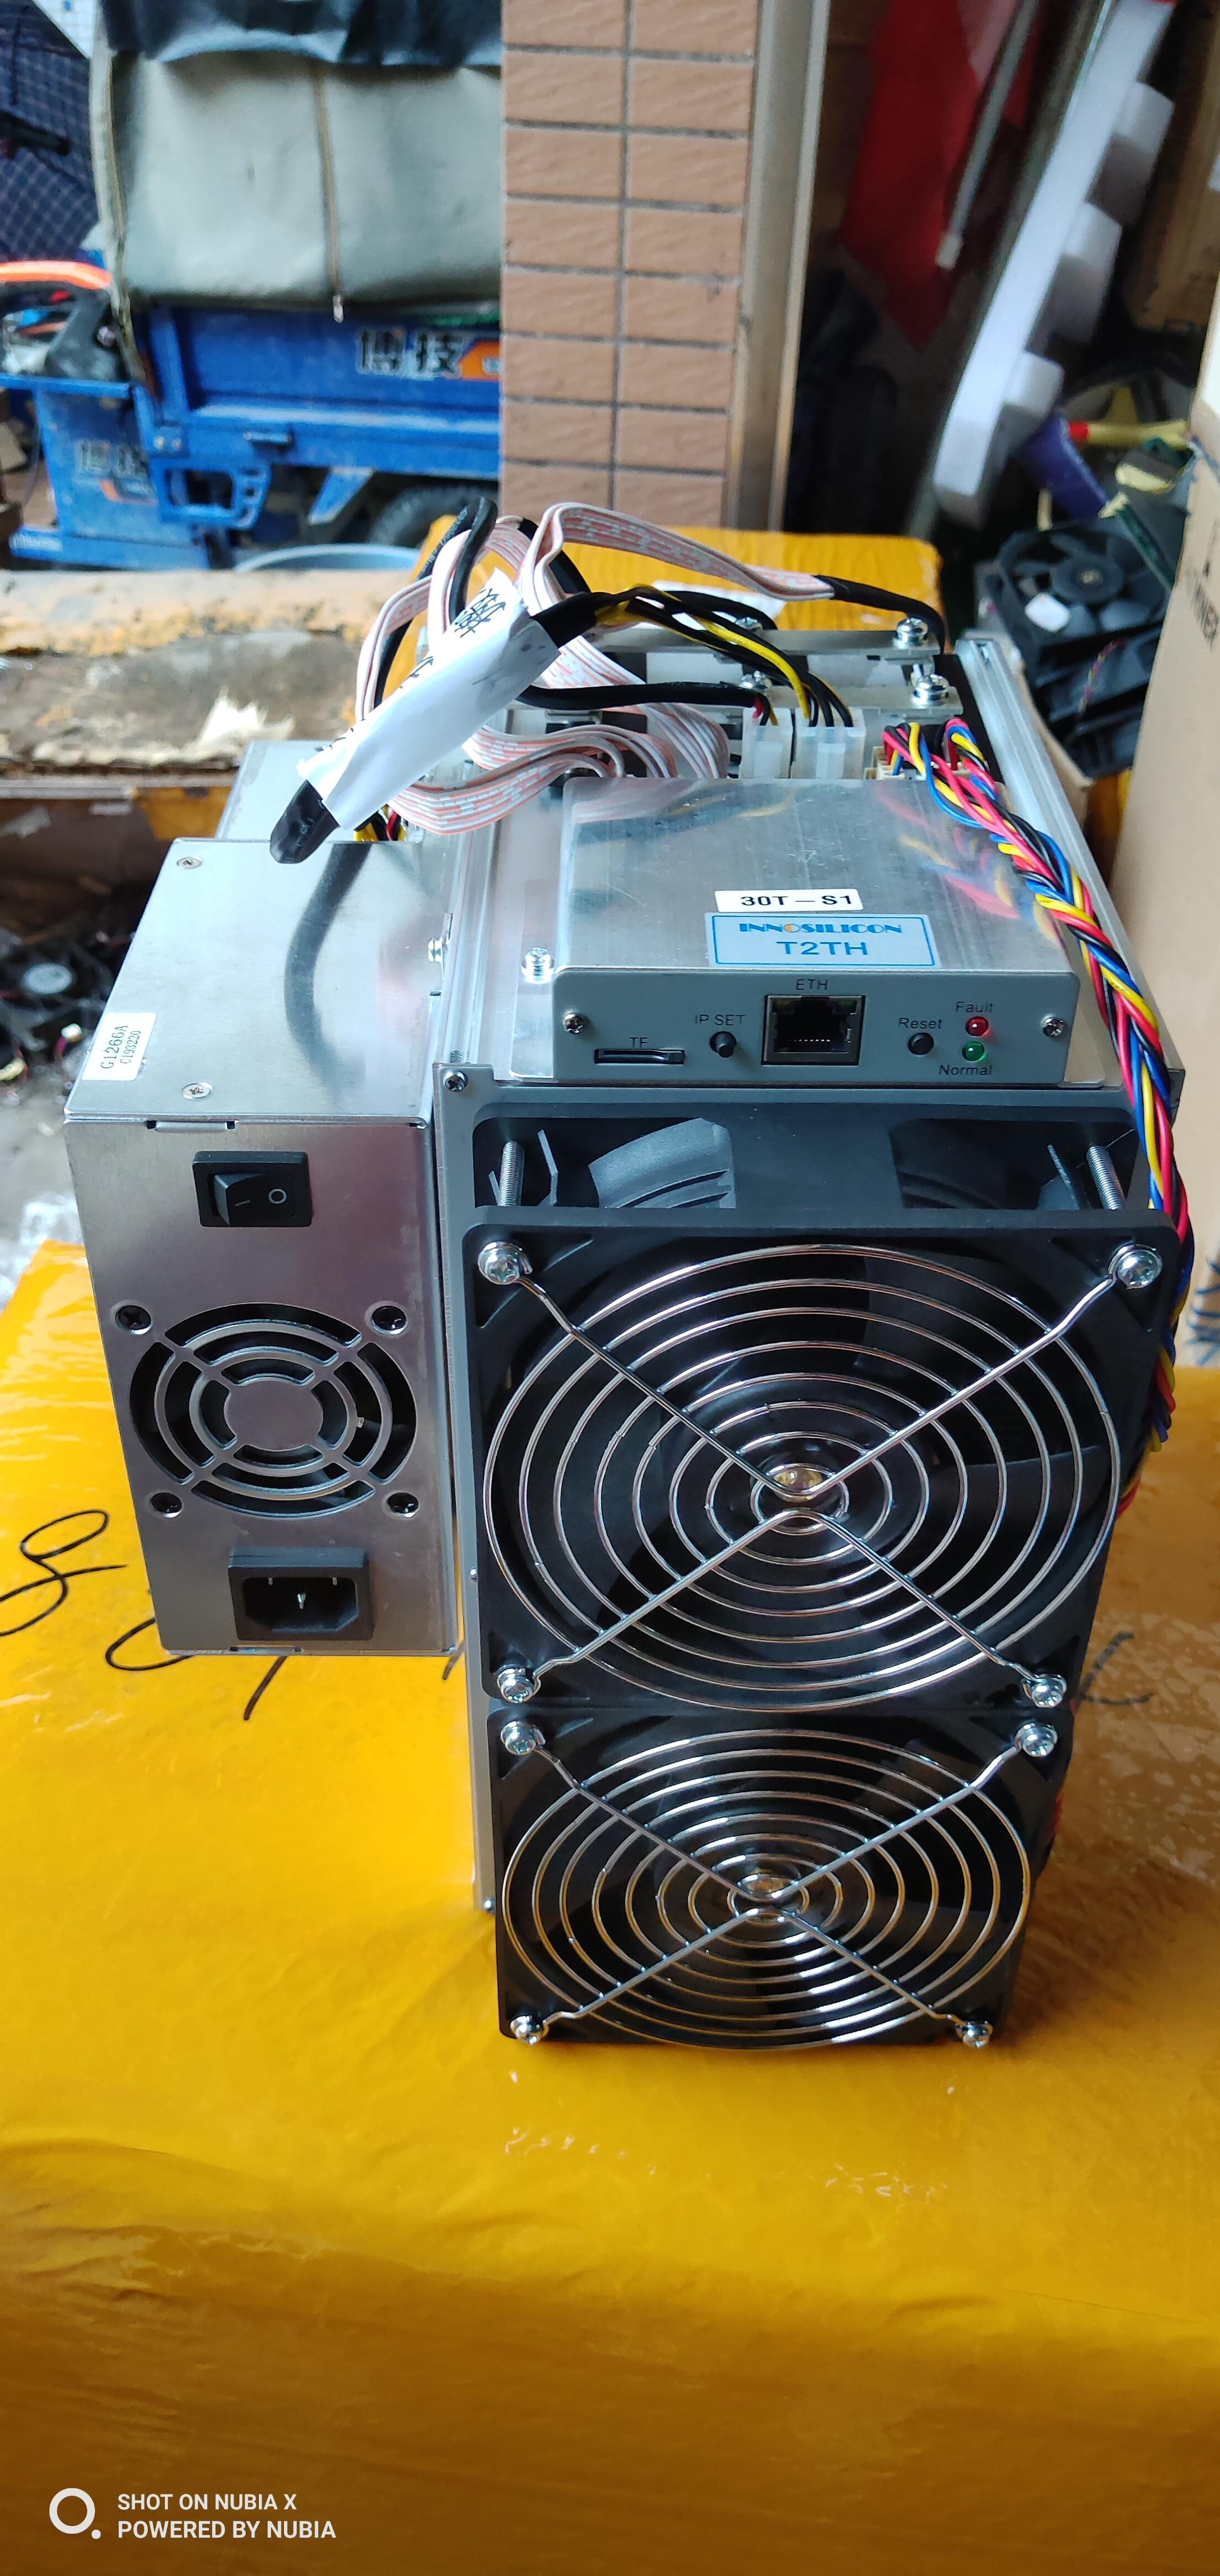 Nouveau Innosilicon T2T 37TH/s SHA256 Bitcoin BTC BCH Miner mieux que what sminer M3 M20S M21S Antminer S9 S17 T17 S17e T17e